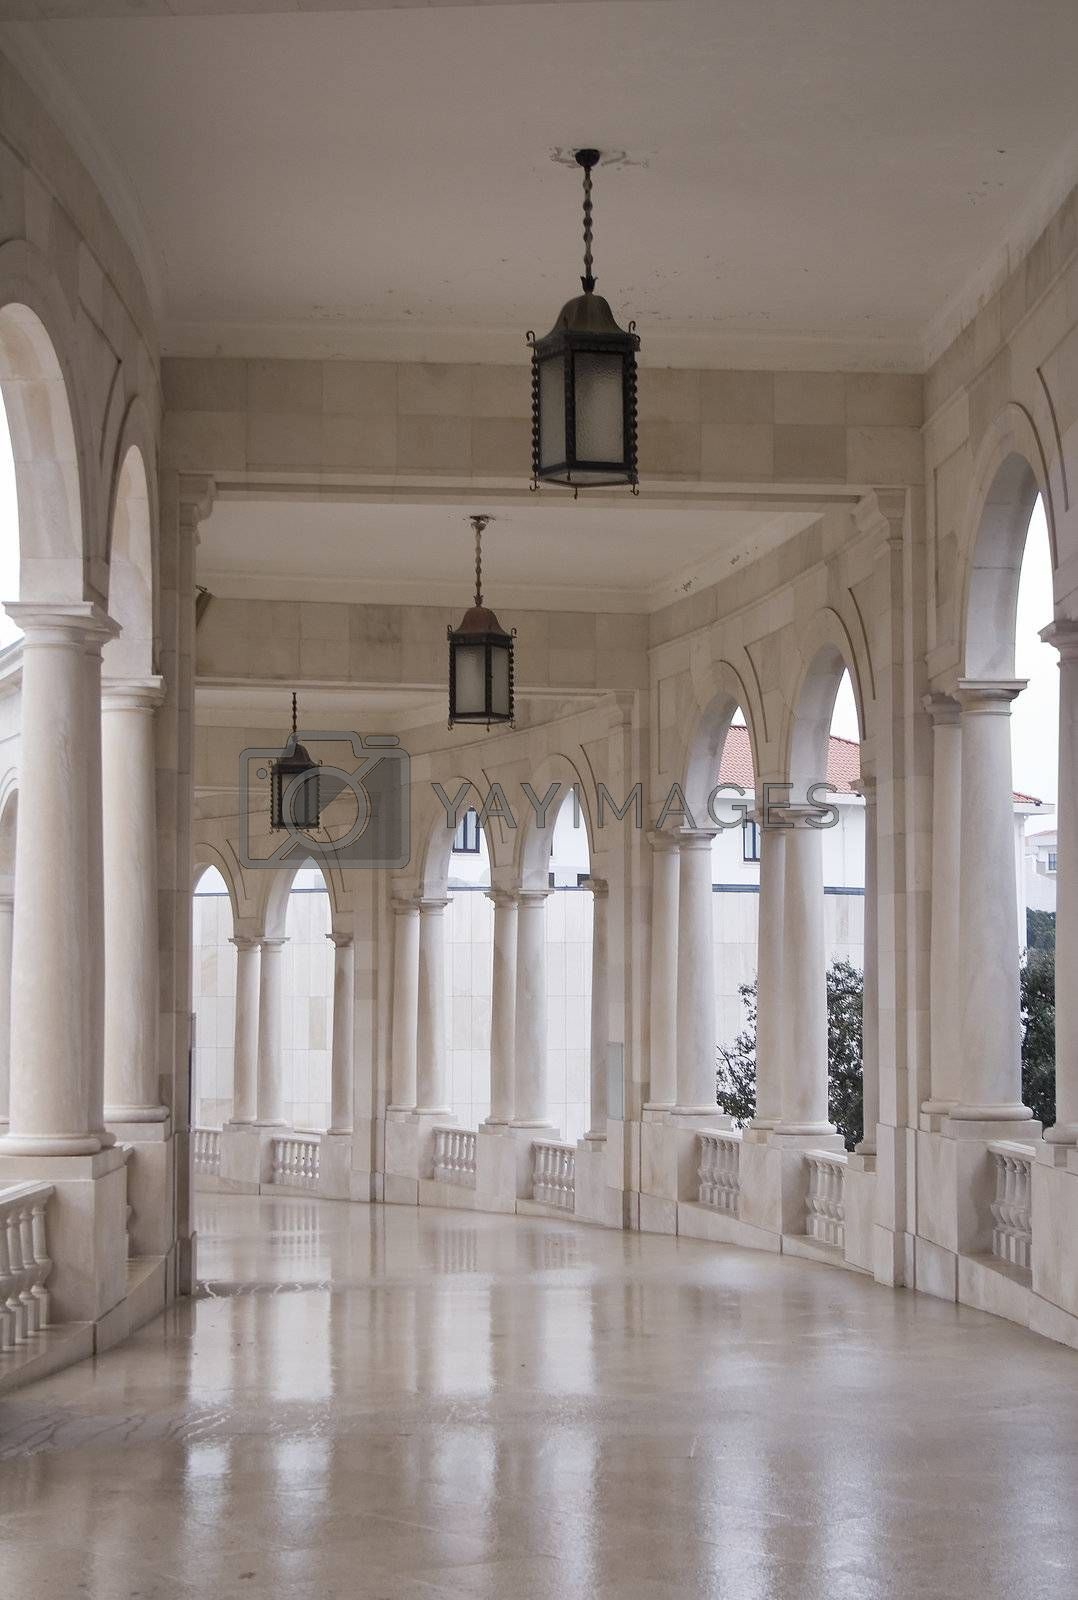 Ancient hallway by PauloResende